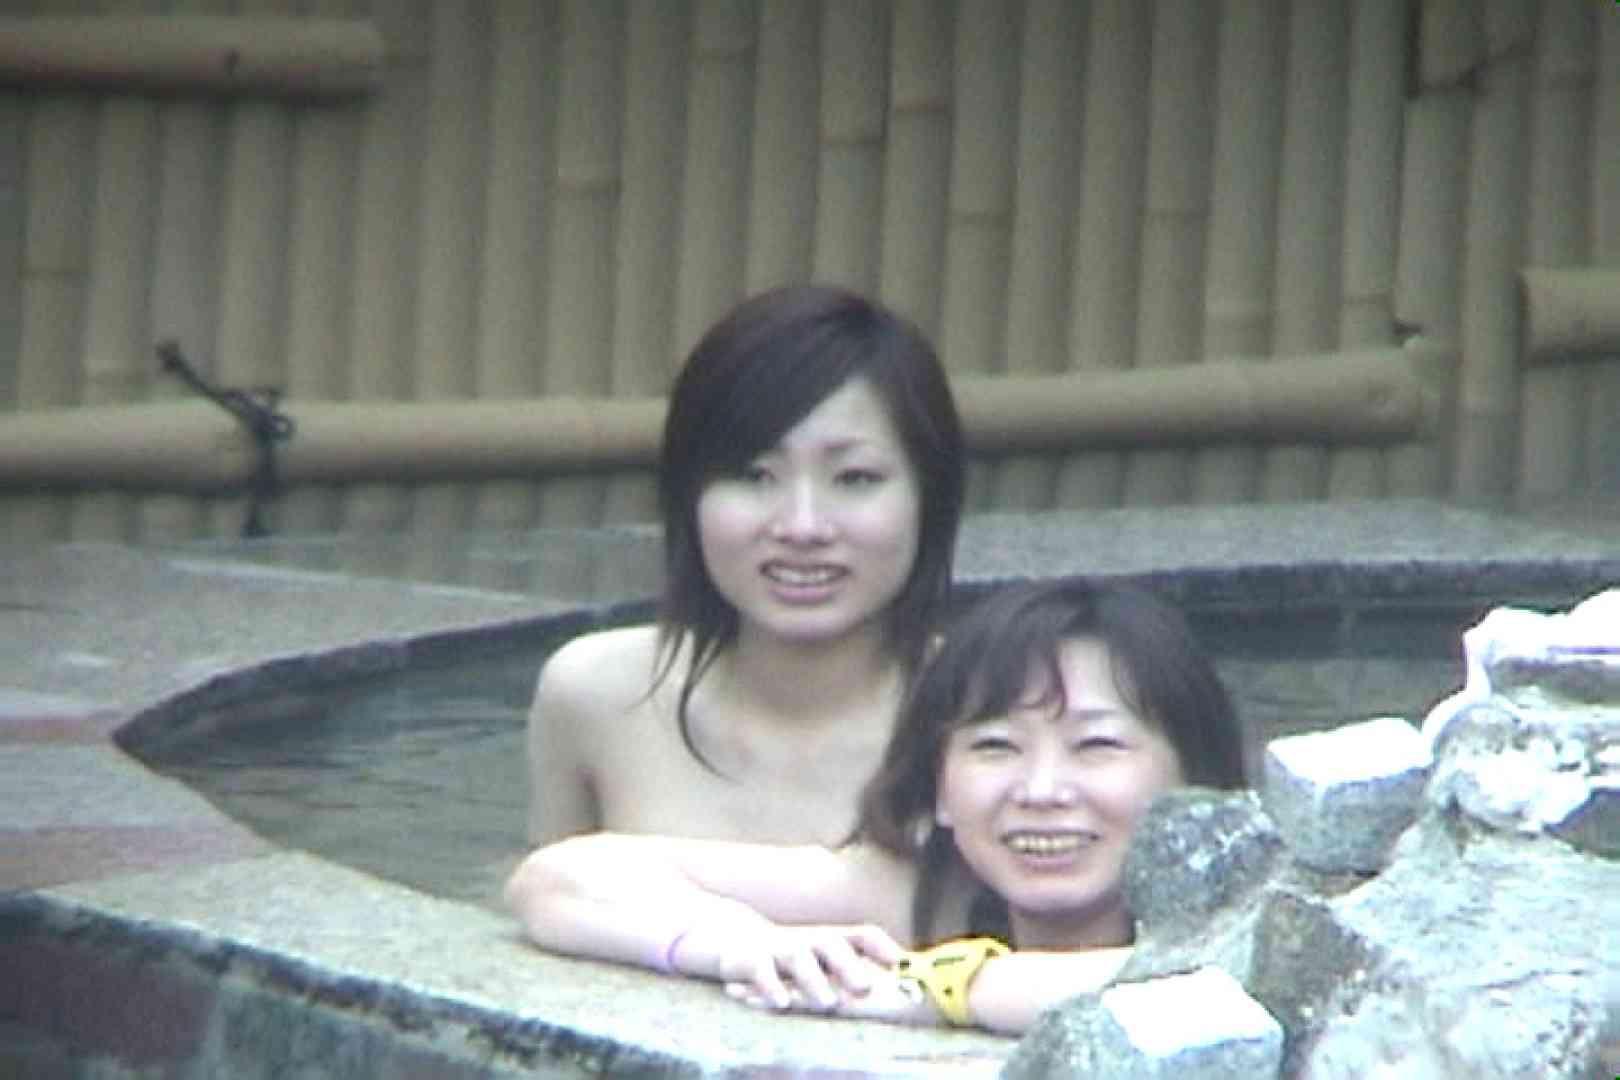 Aquaな露天風呂Vol.58【VIP限定】 HなOL  95pic 36